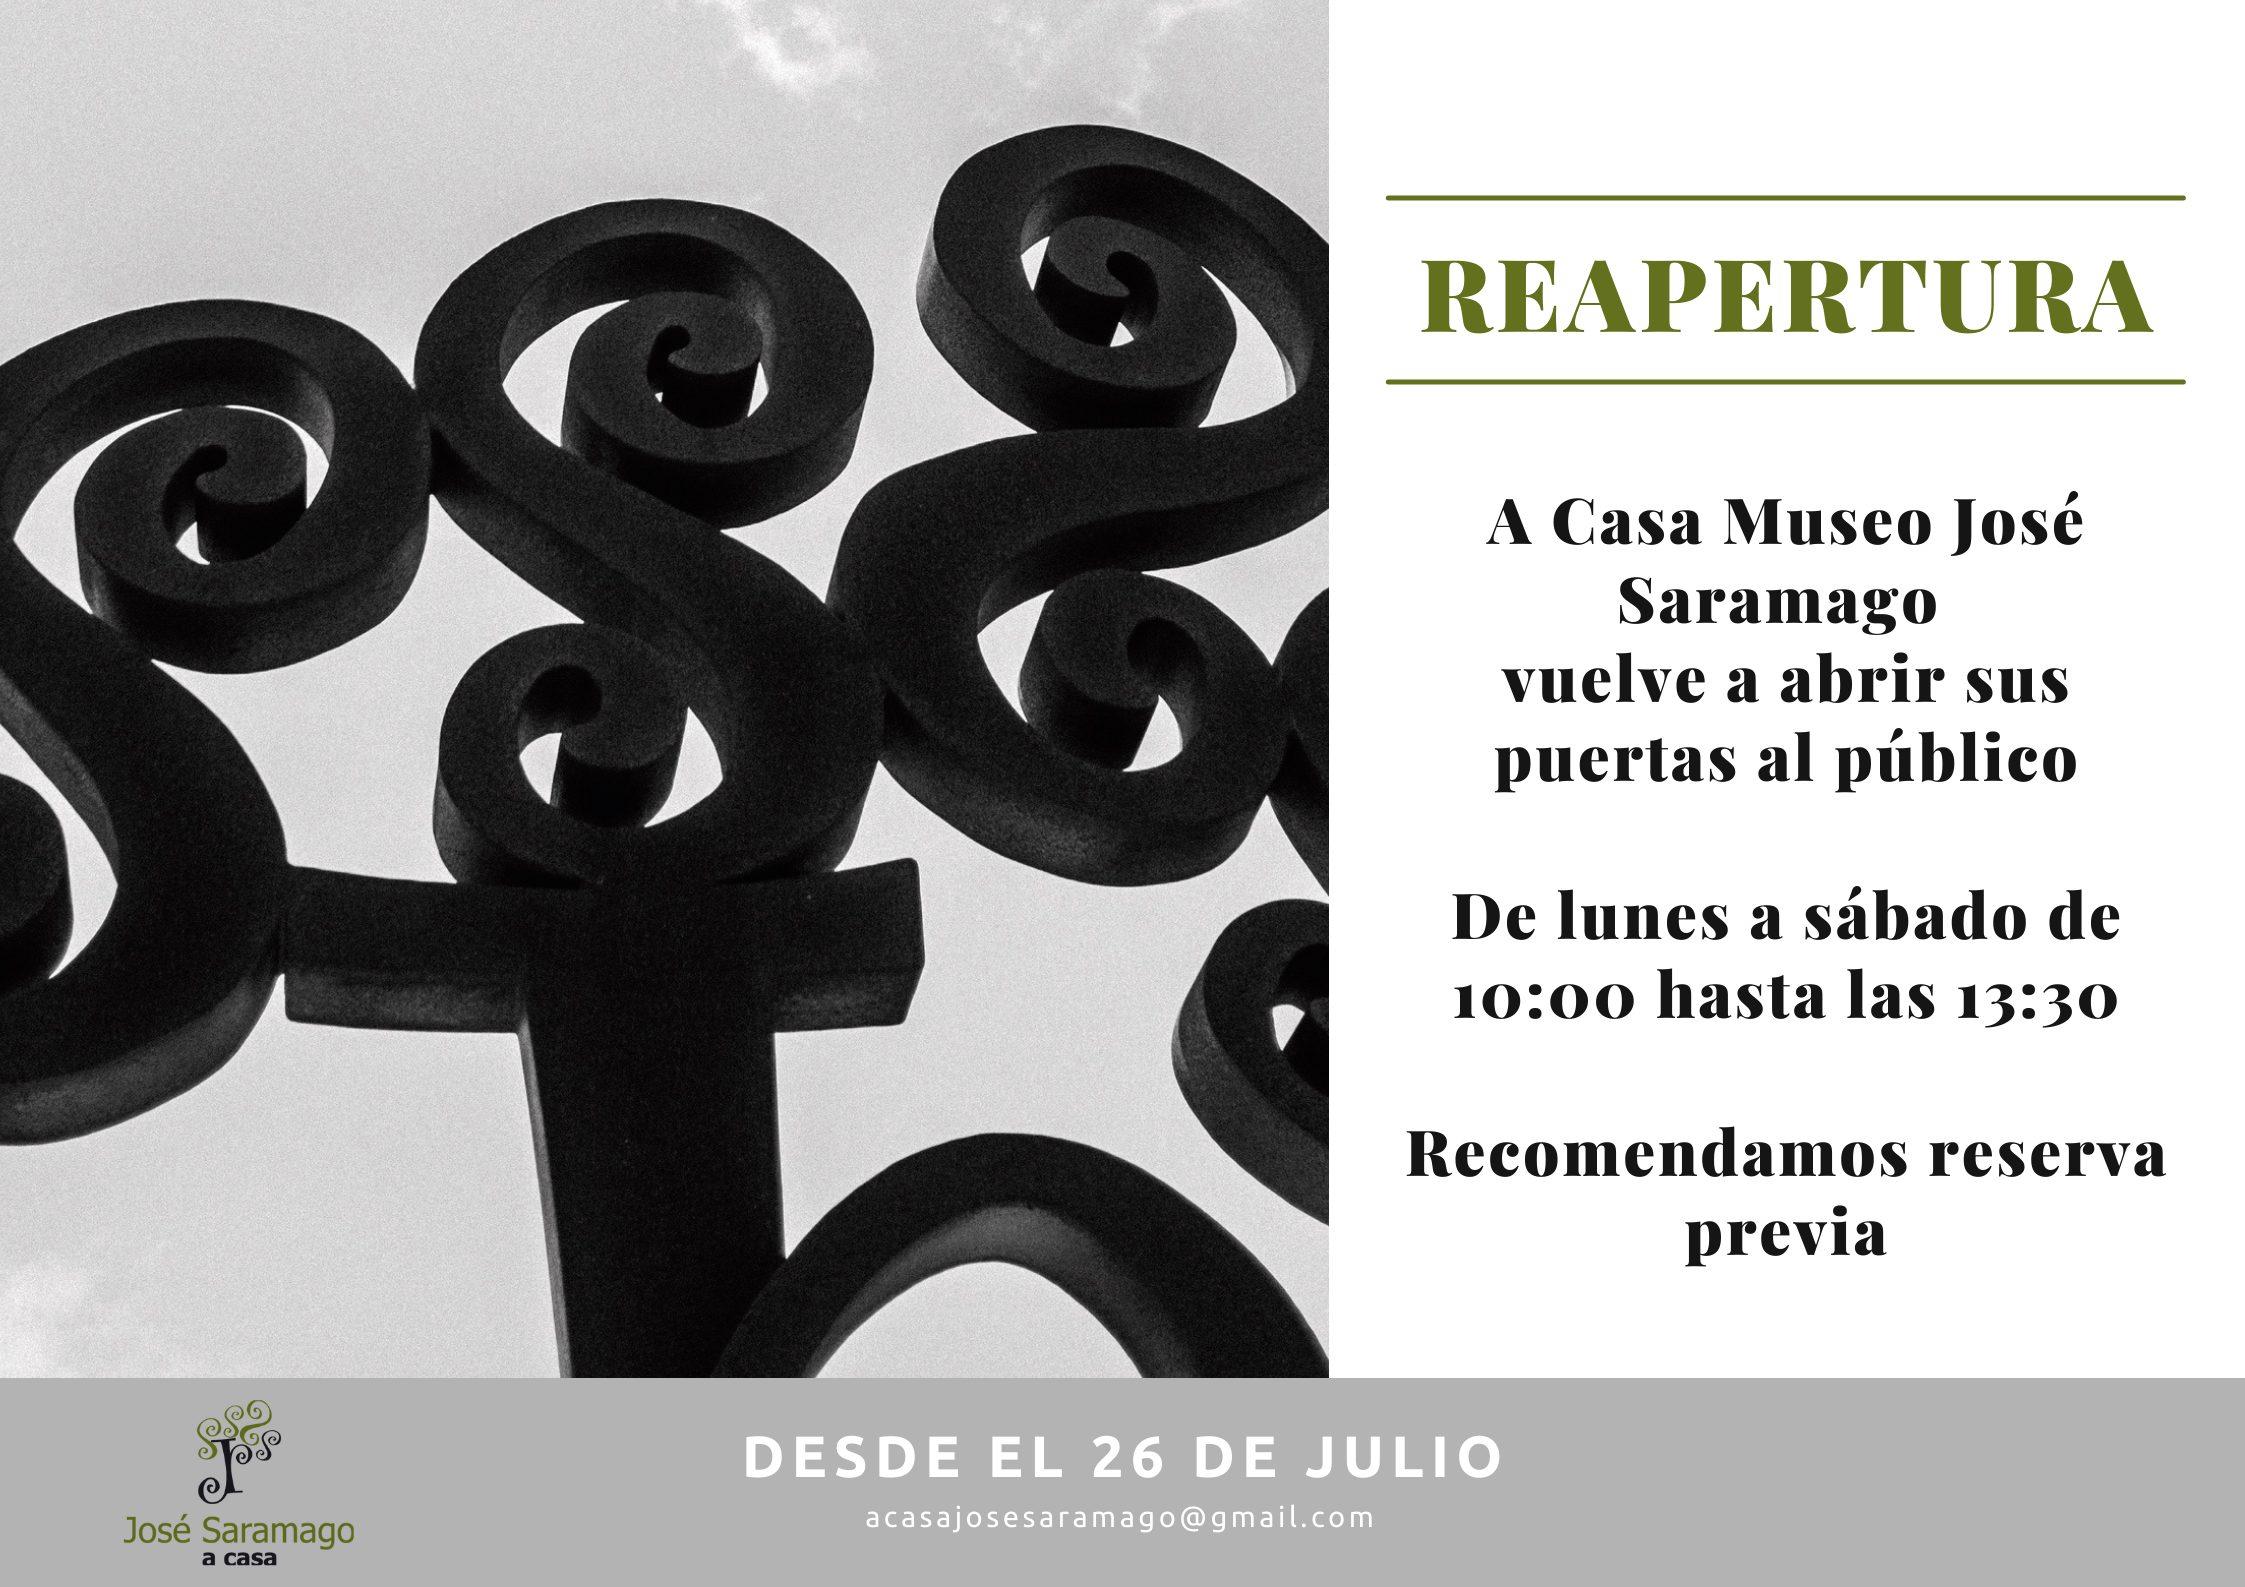 Reapertura A Casa Museo José Saramago